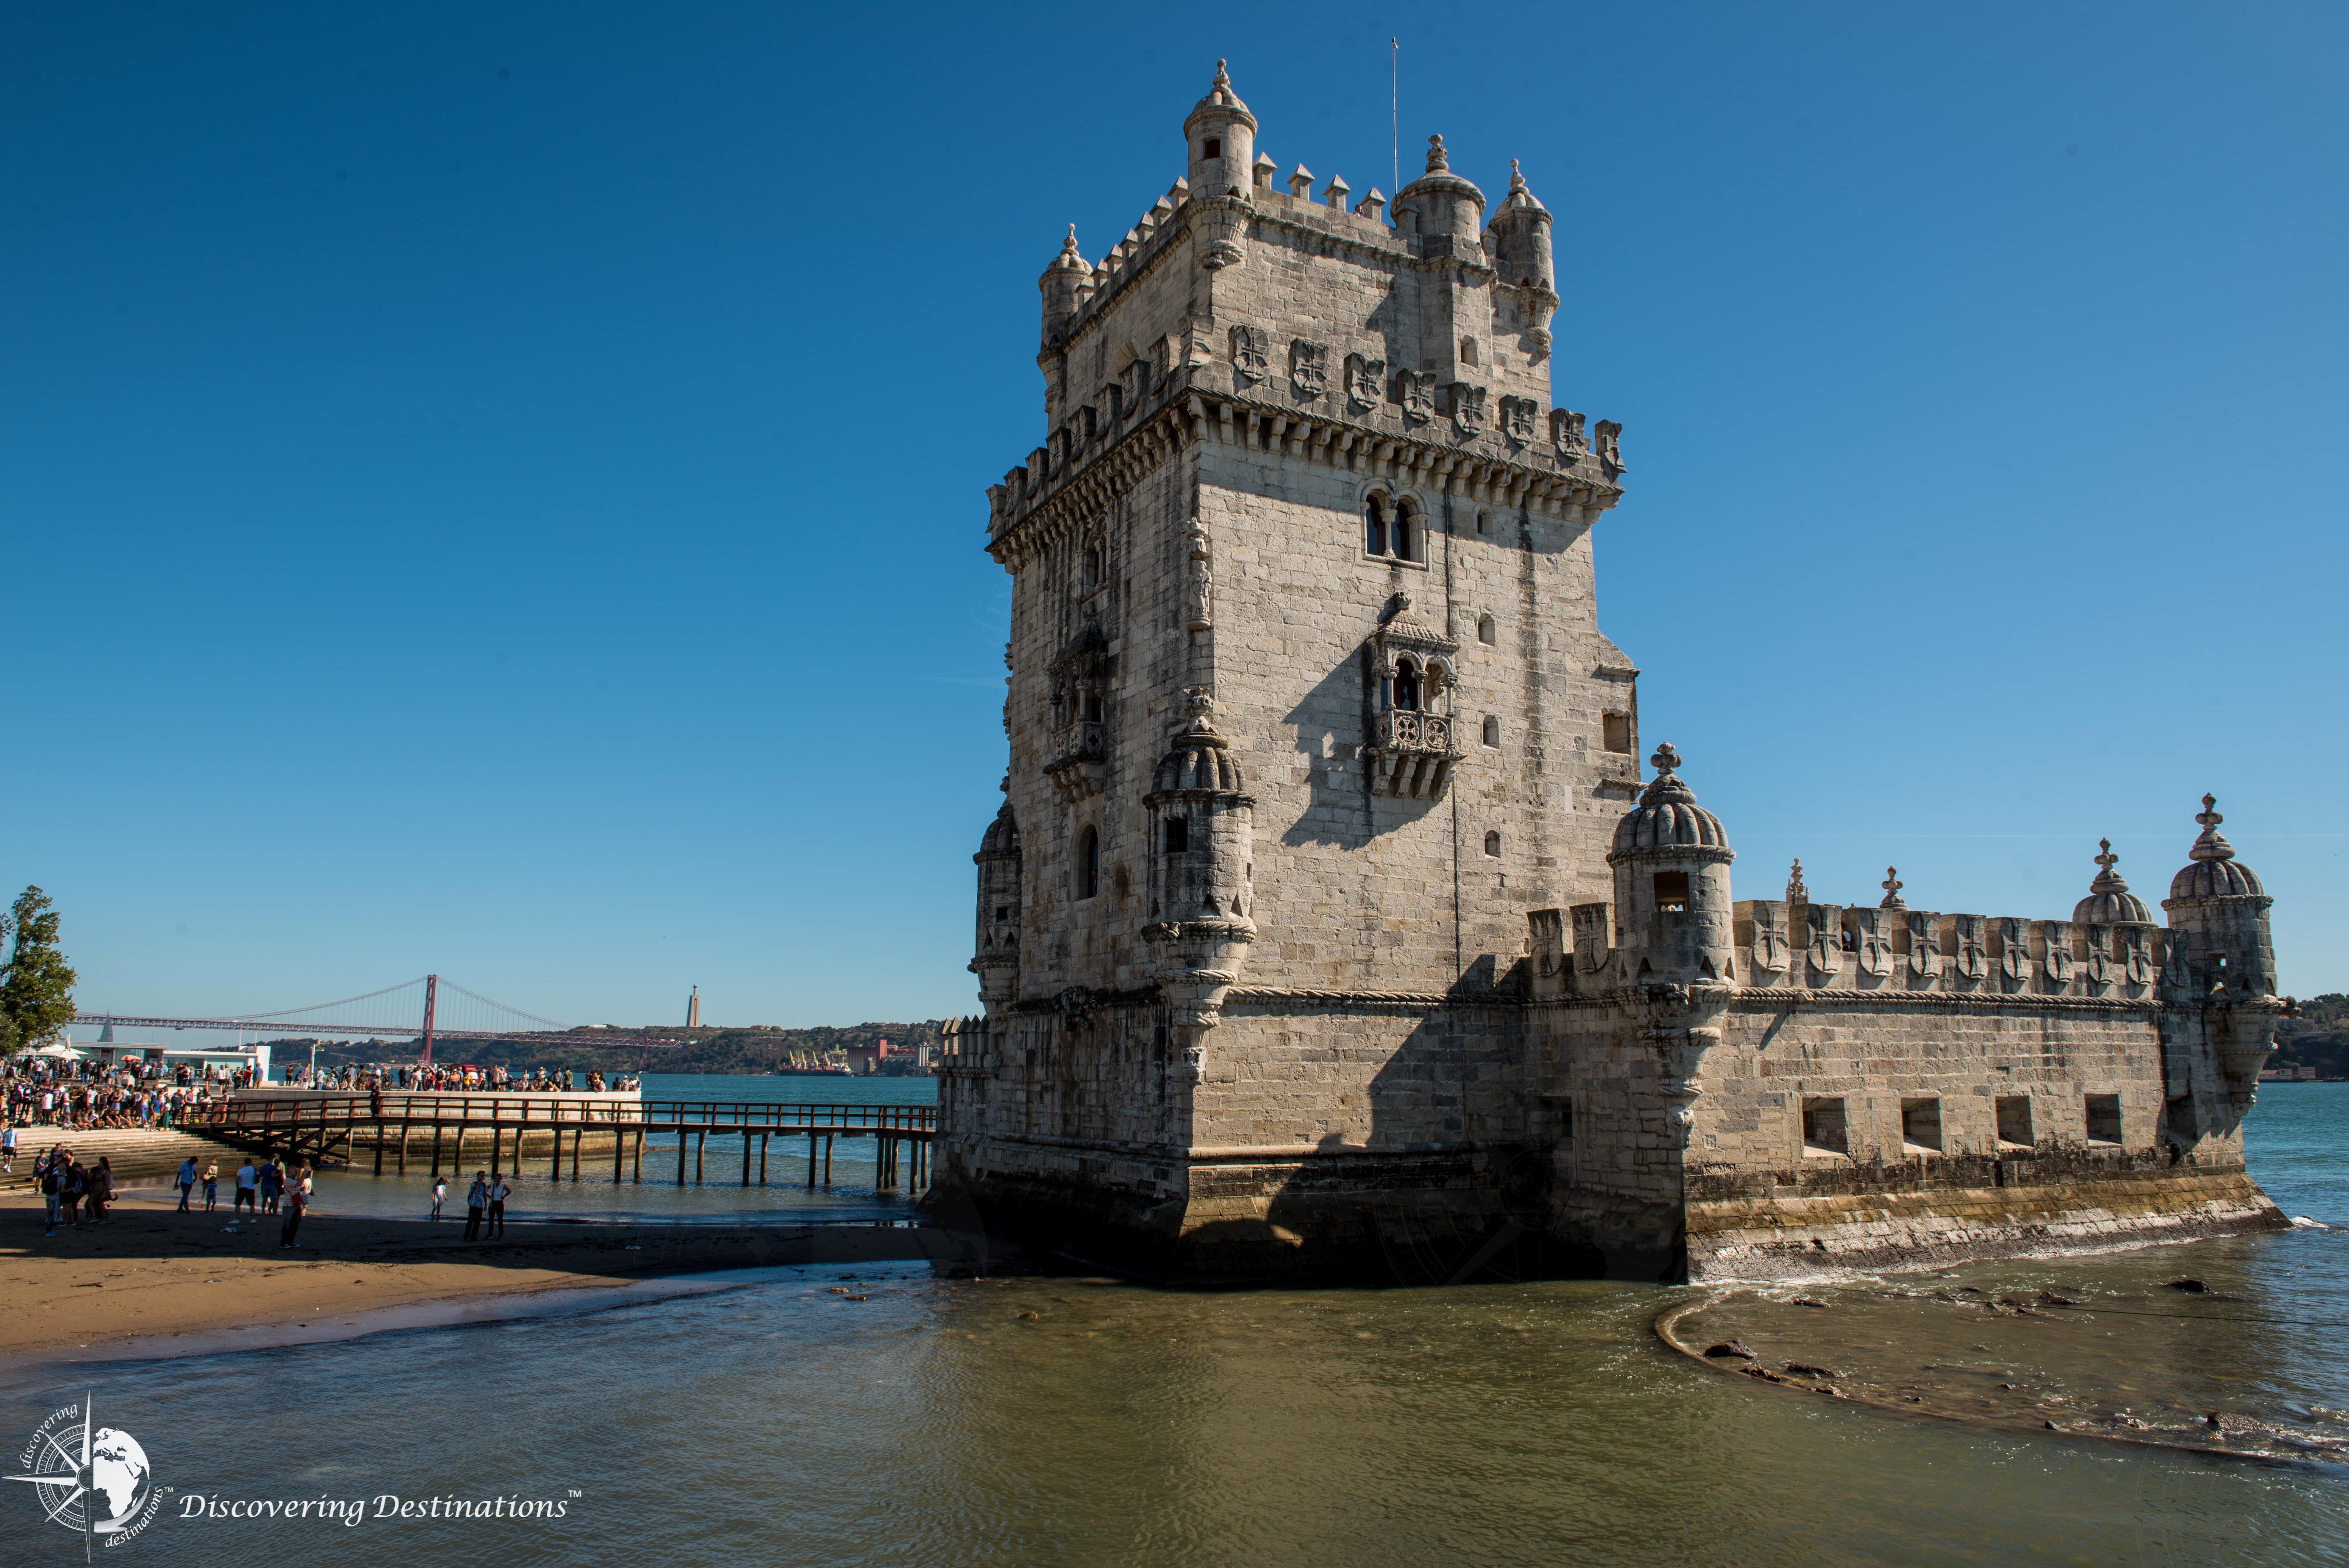 Close up of the Belém Tower